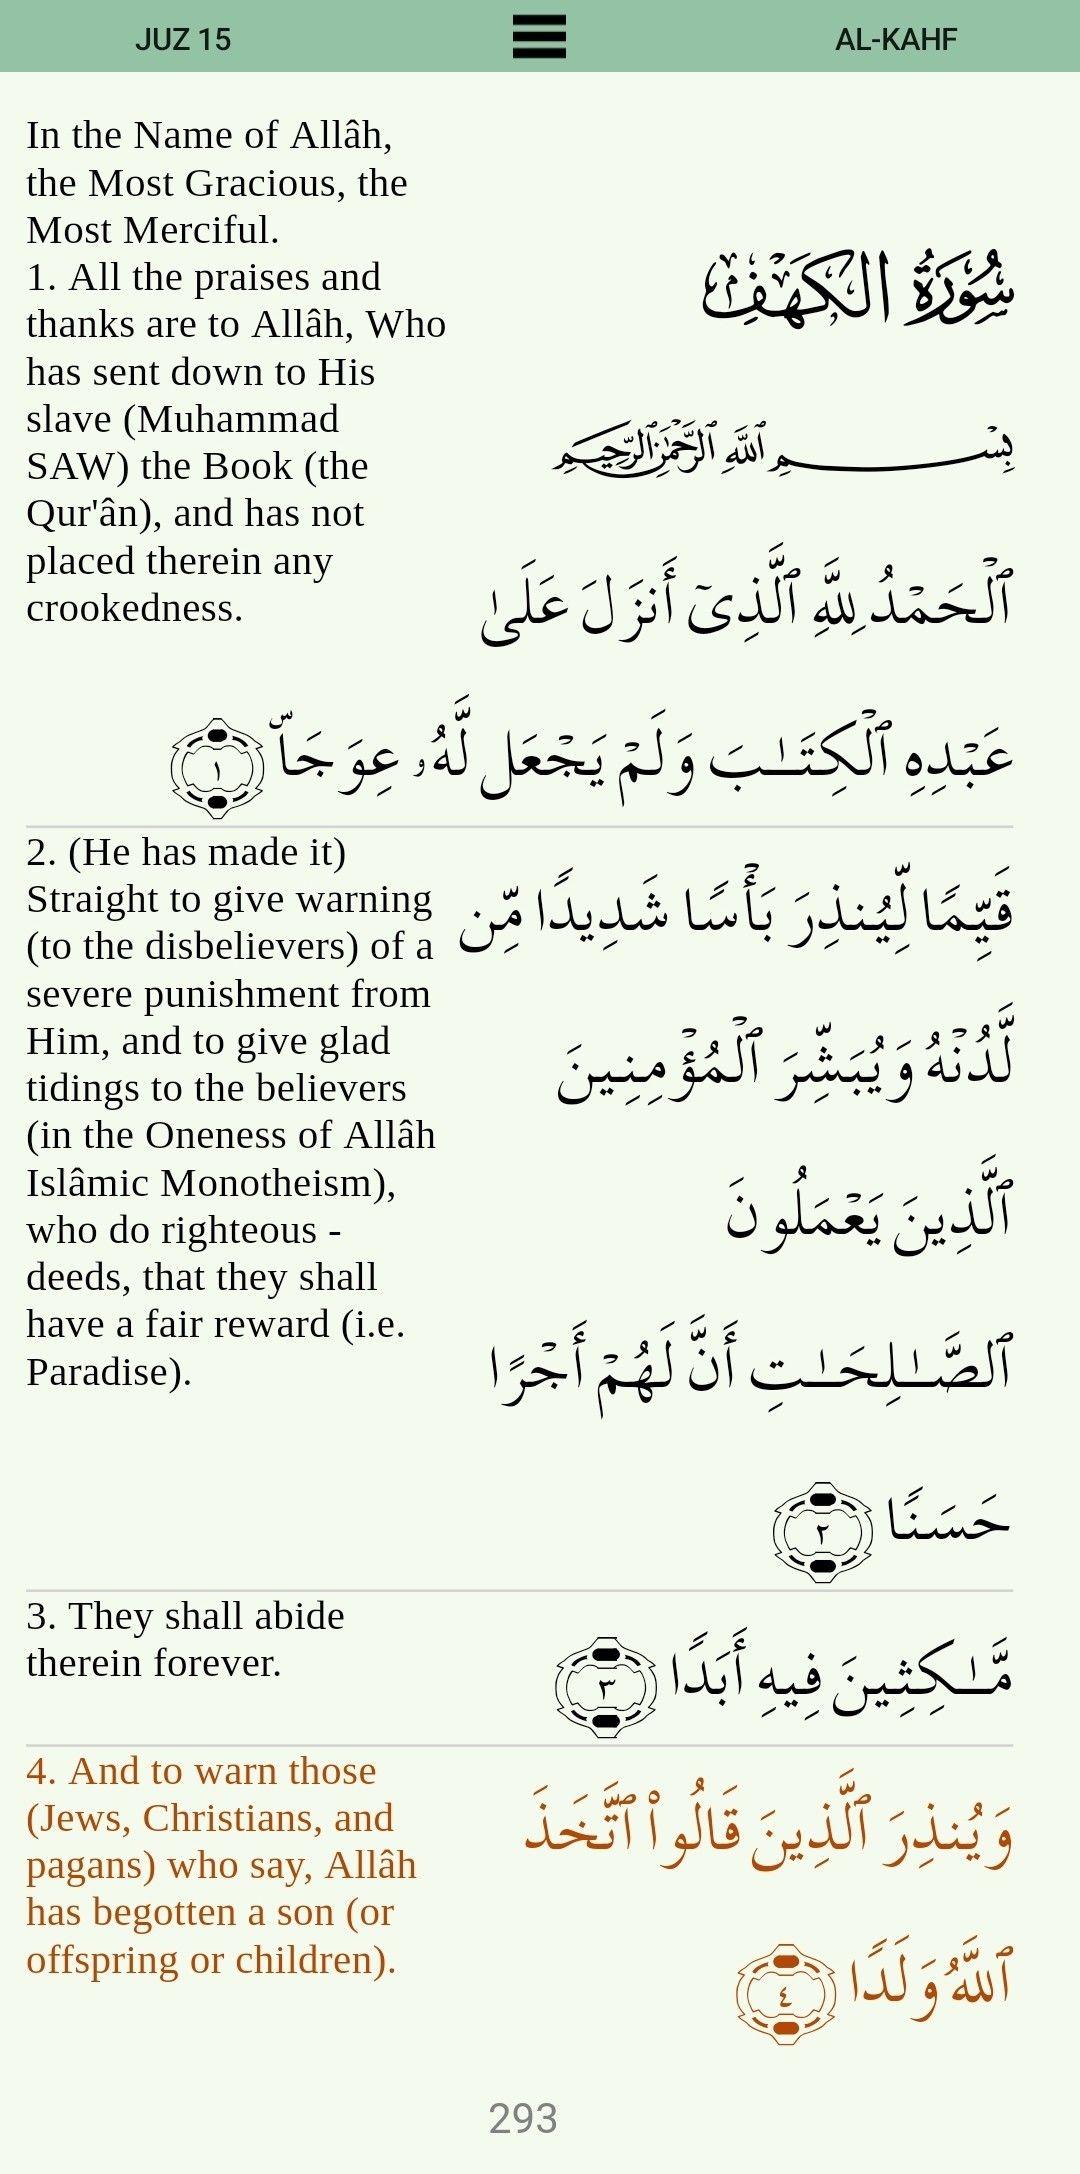 Pin By The Noble Quran On Surat Al Kahf Quran Friday Quran Al Kahf Gracious